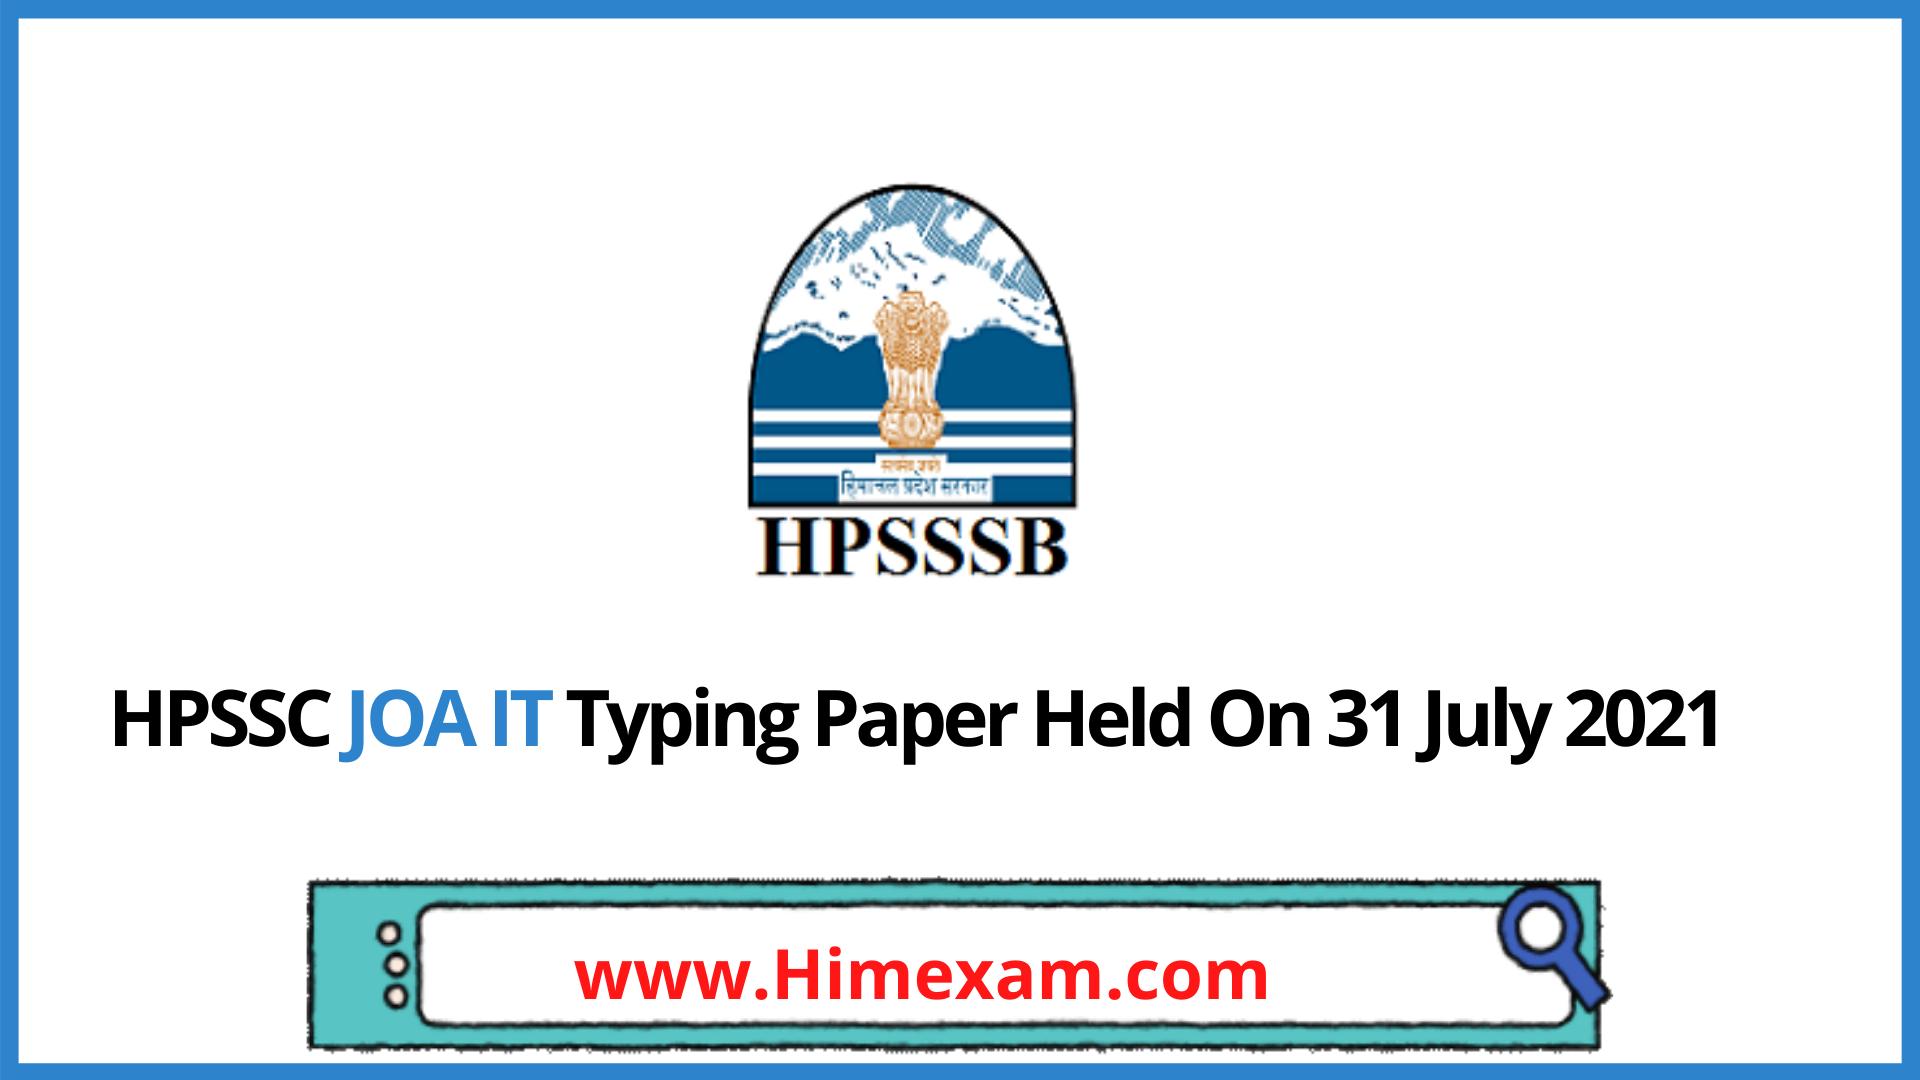 HPSSC JOA IT Typing Paper Held On 31 July 2021